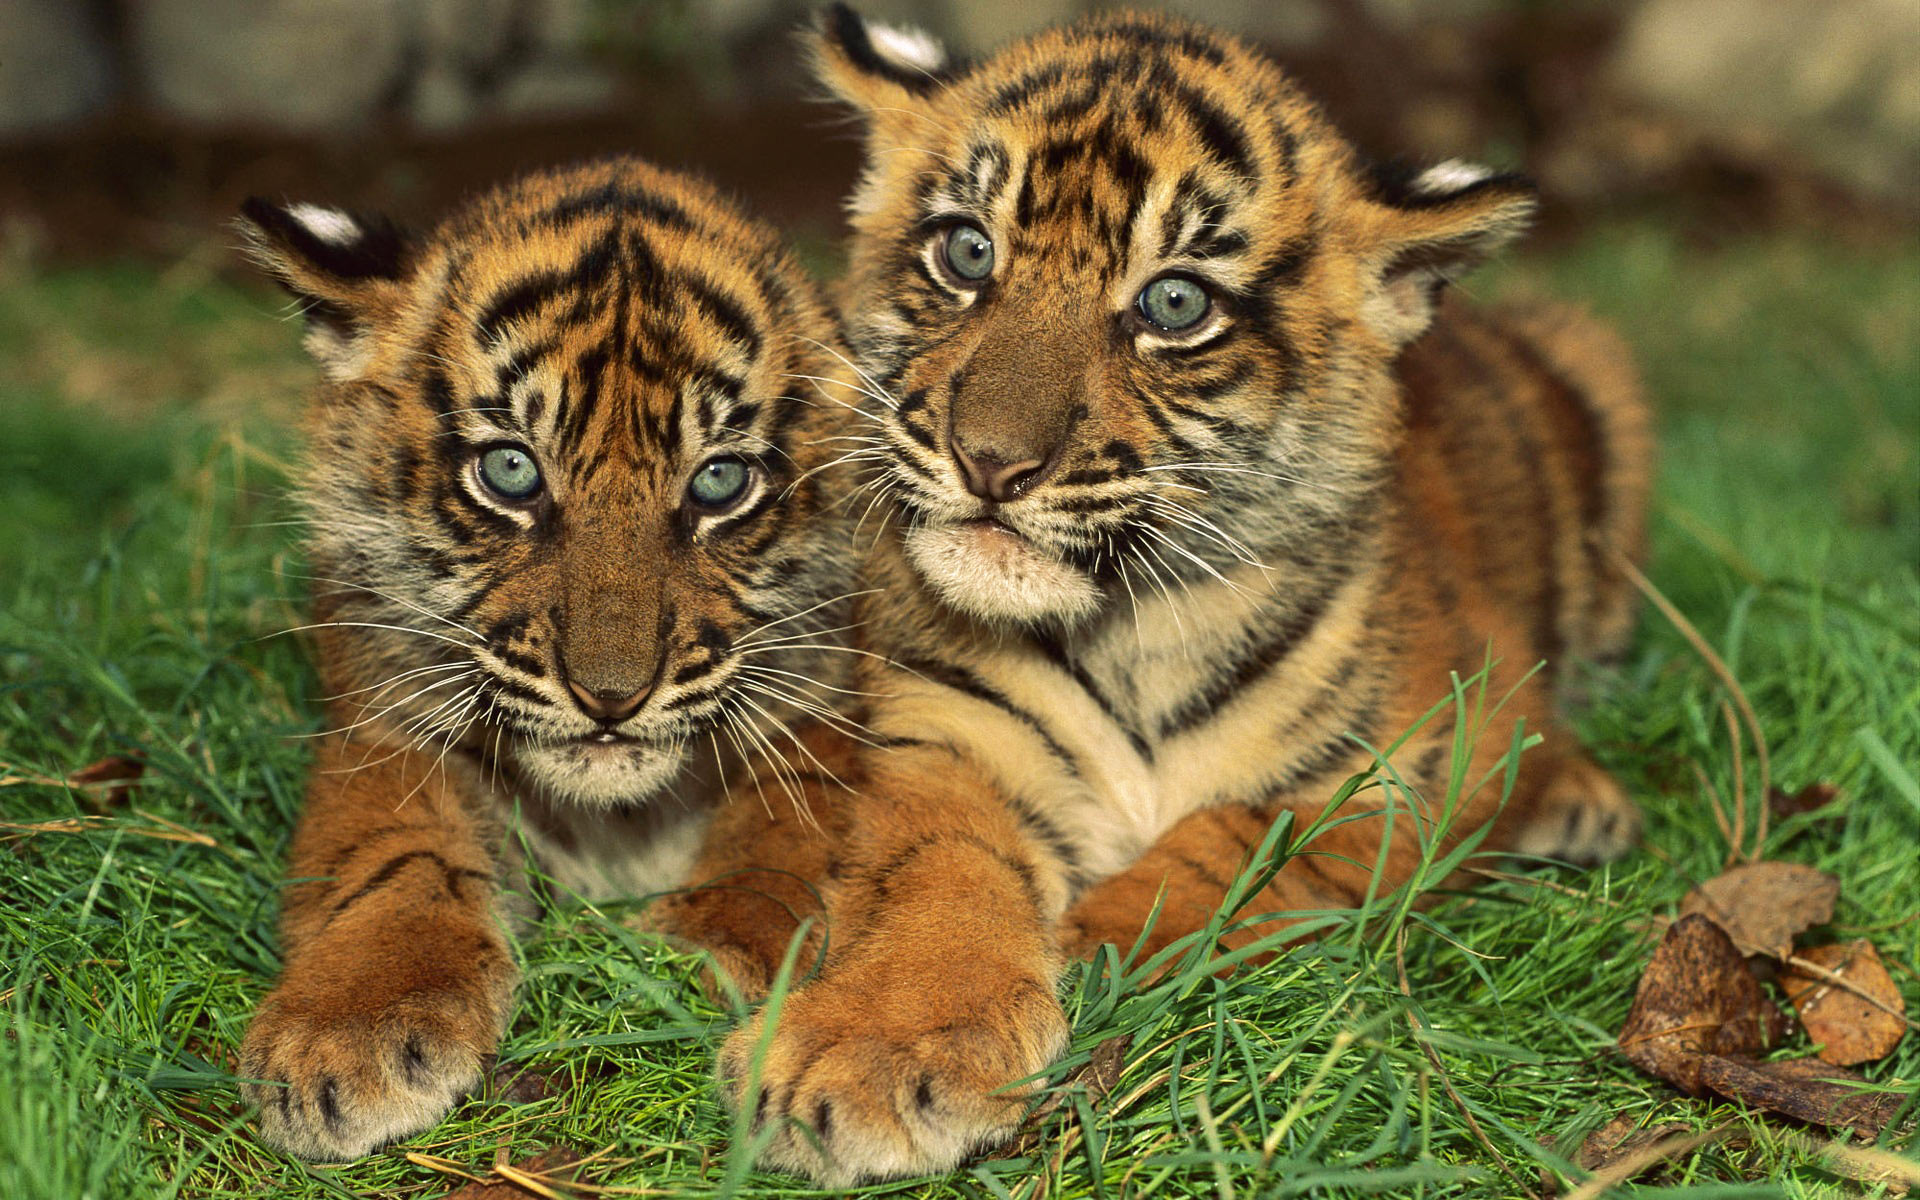 Fondos De Pantalla De Animales Bebes: Fondo De Pantalla Tigres Bebe Acostados 1920x1200